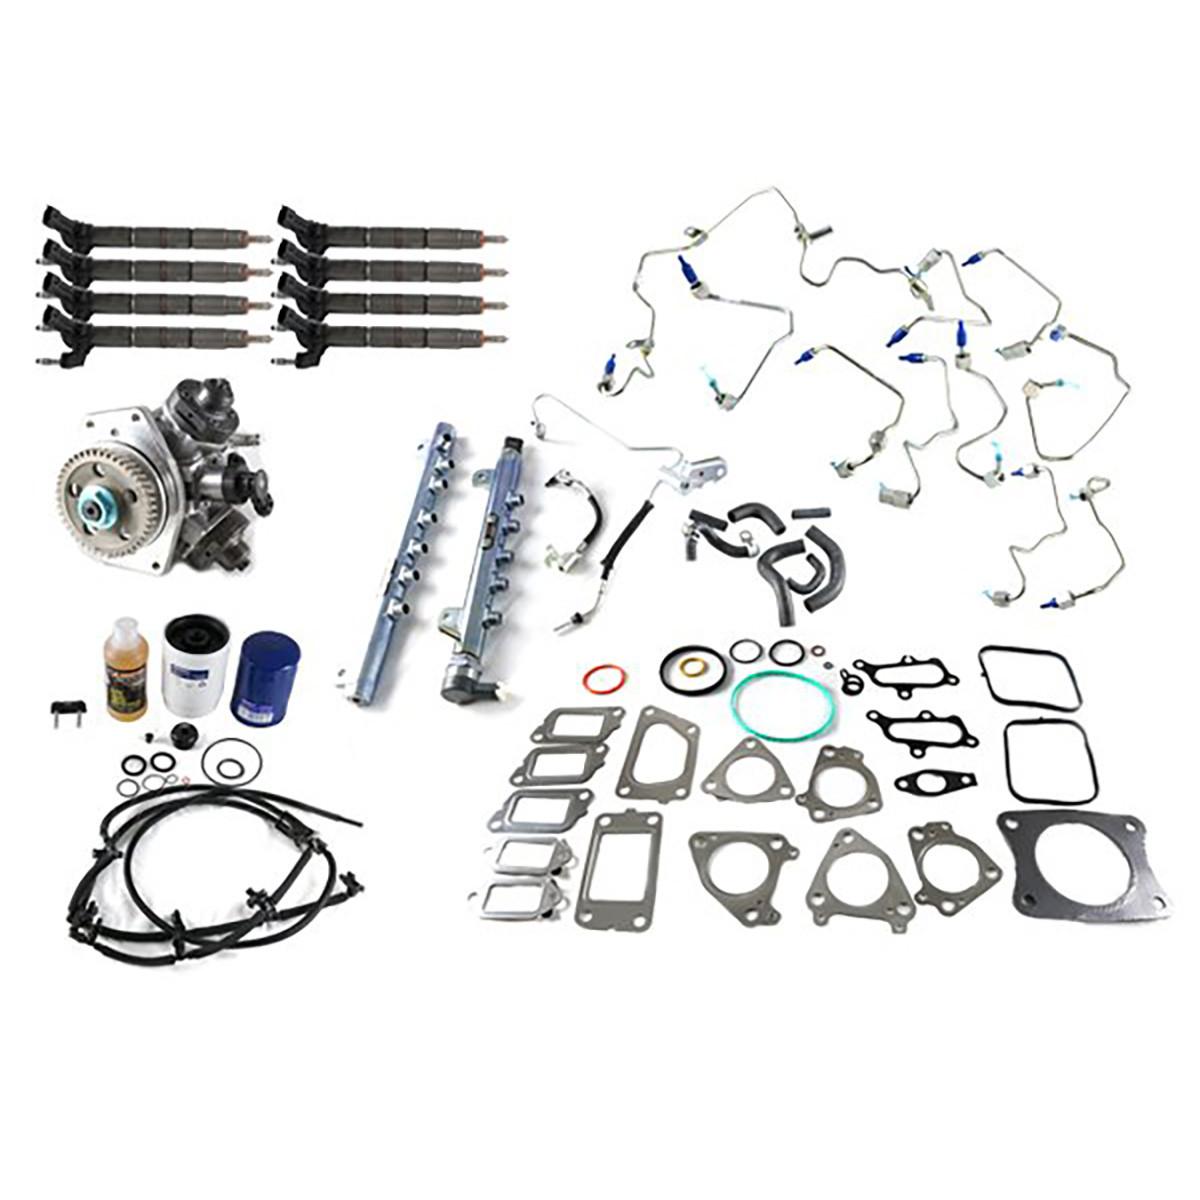 Merchant Automotive Fuel System Replacement Kit for 11-16